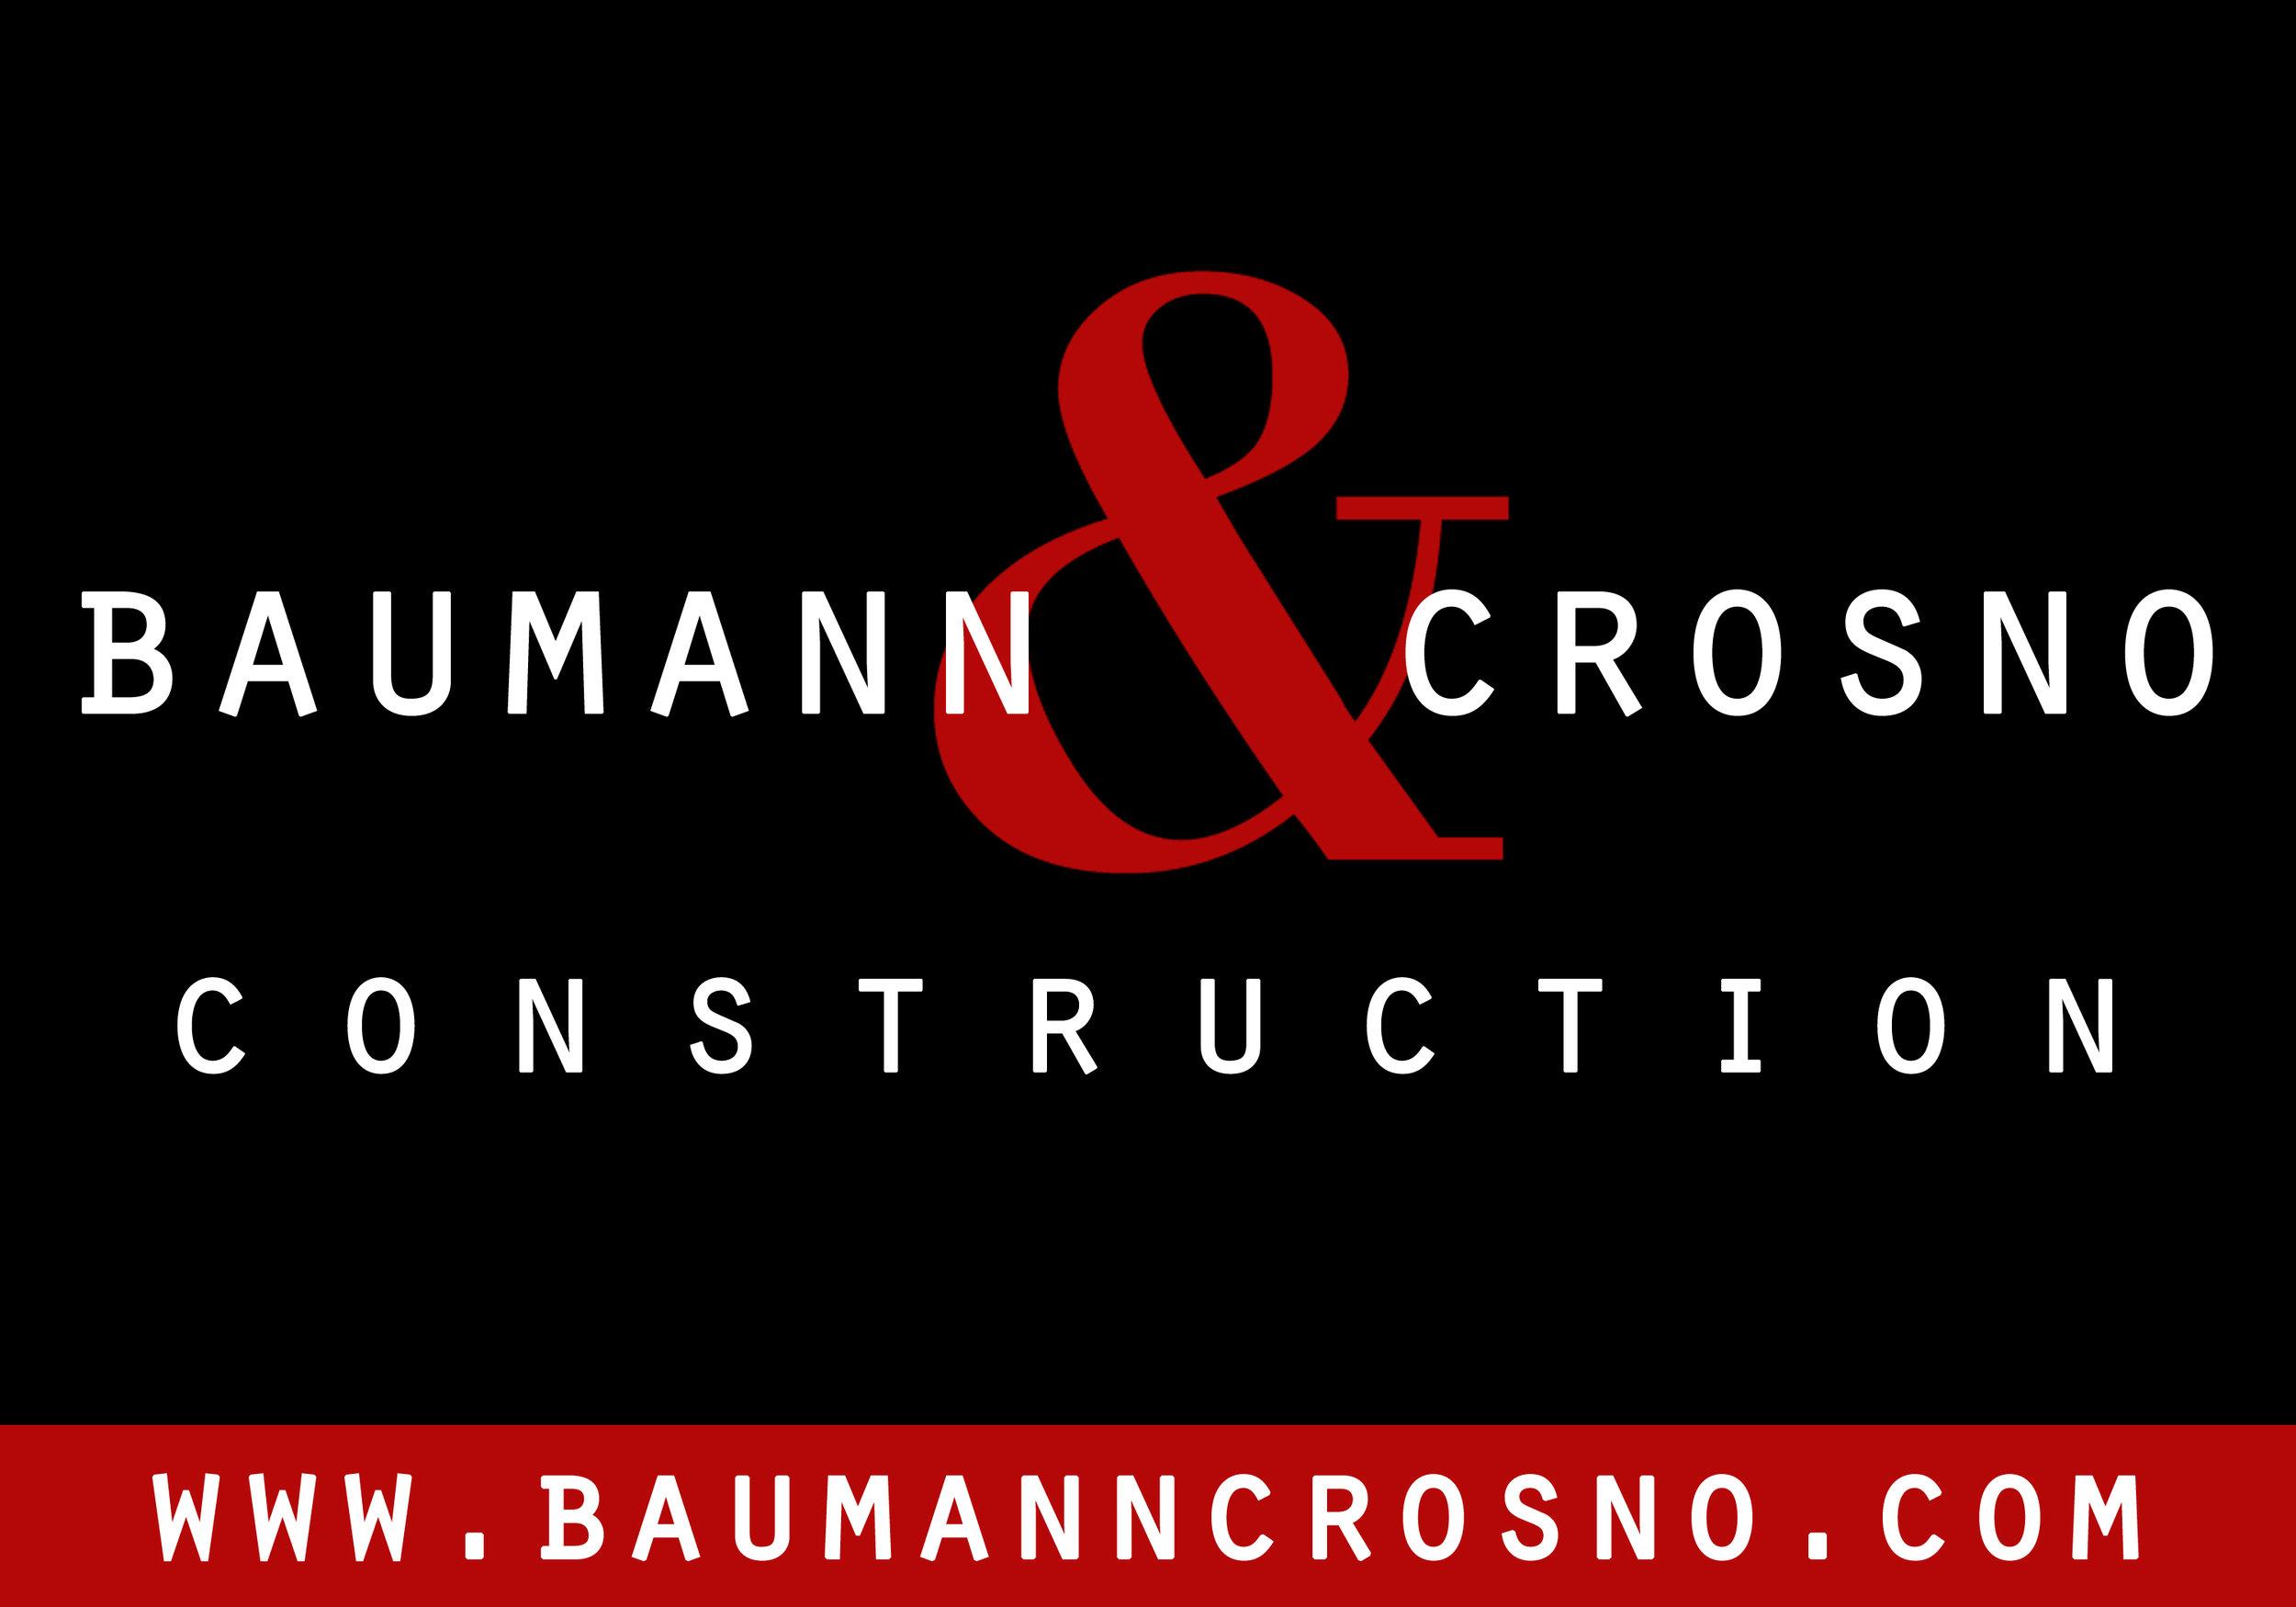 Baumann and Crosno Construction.jpg